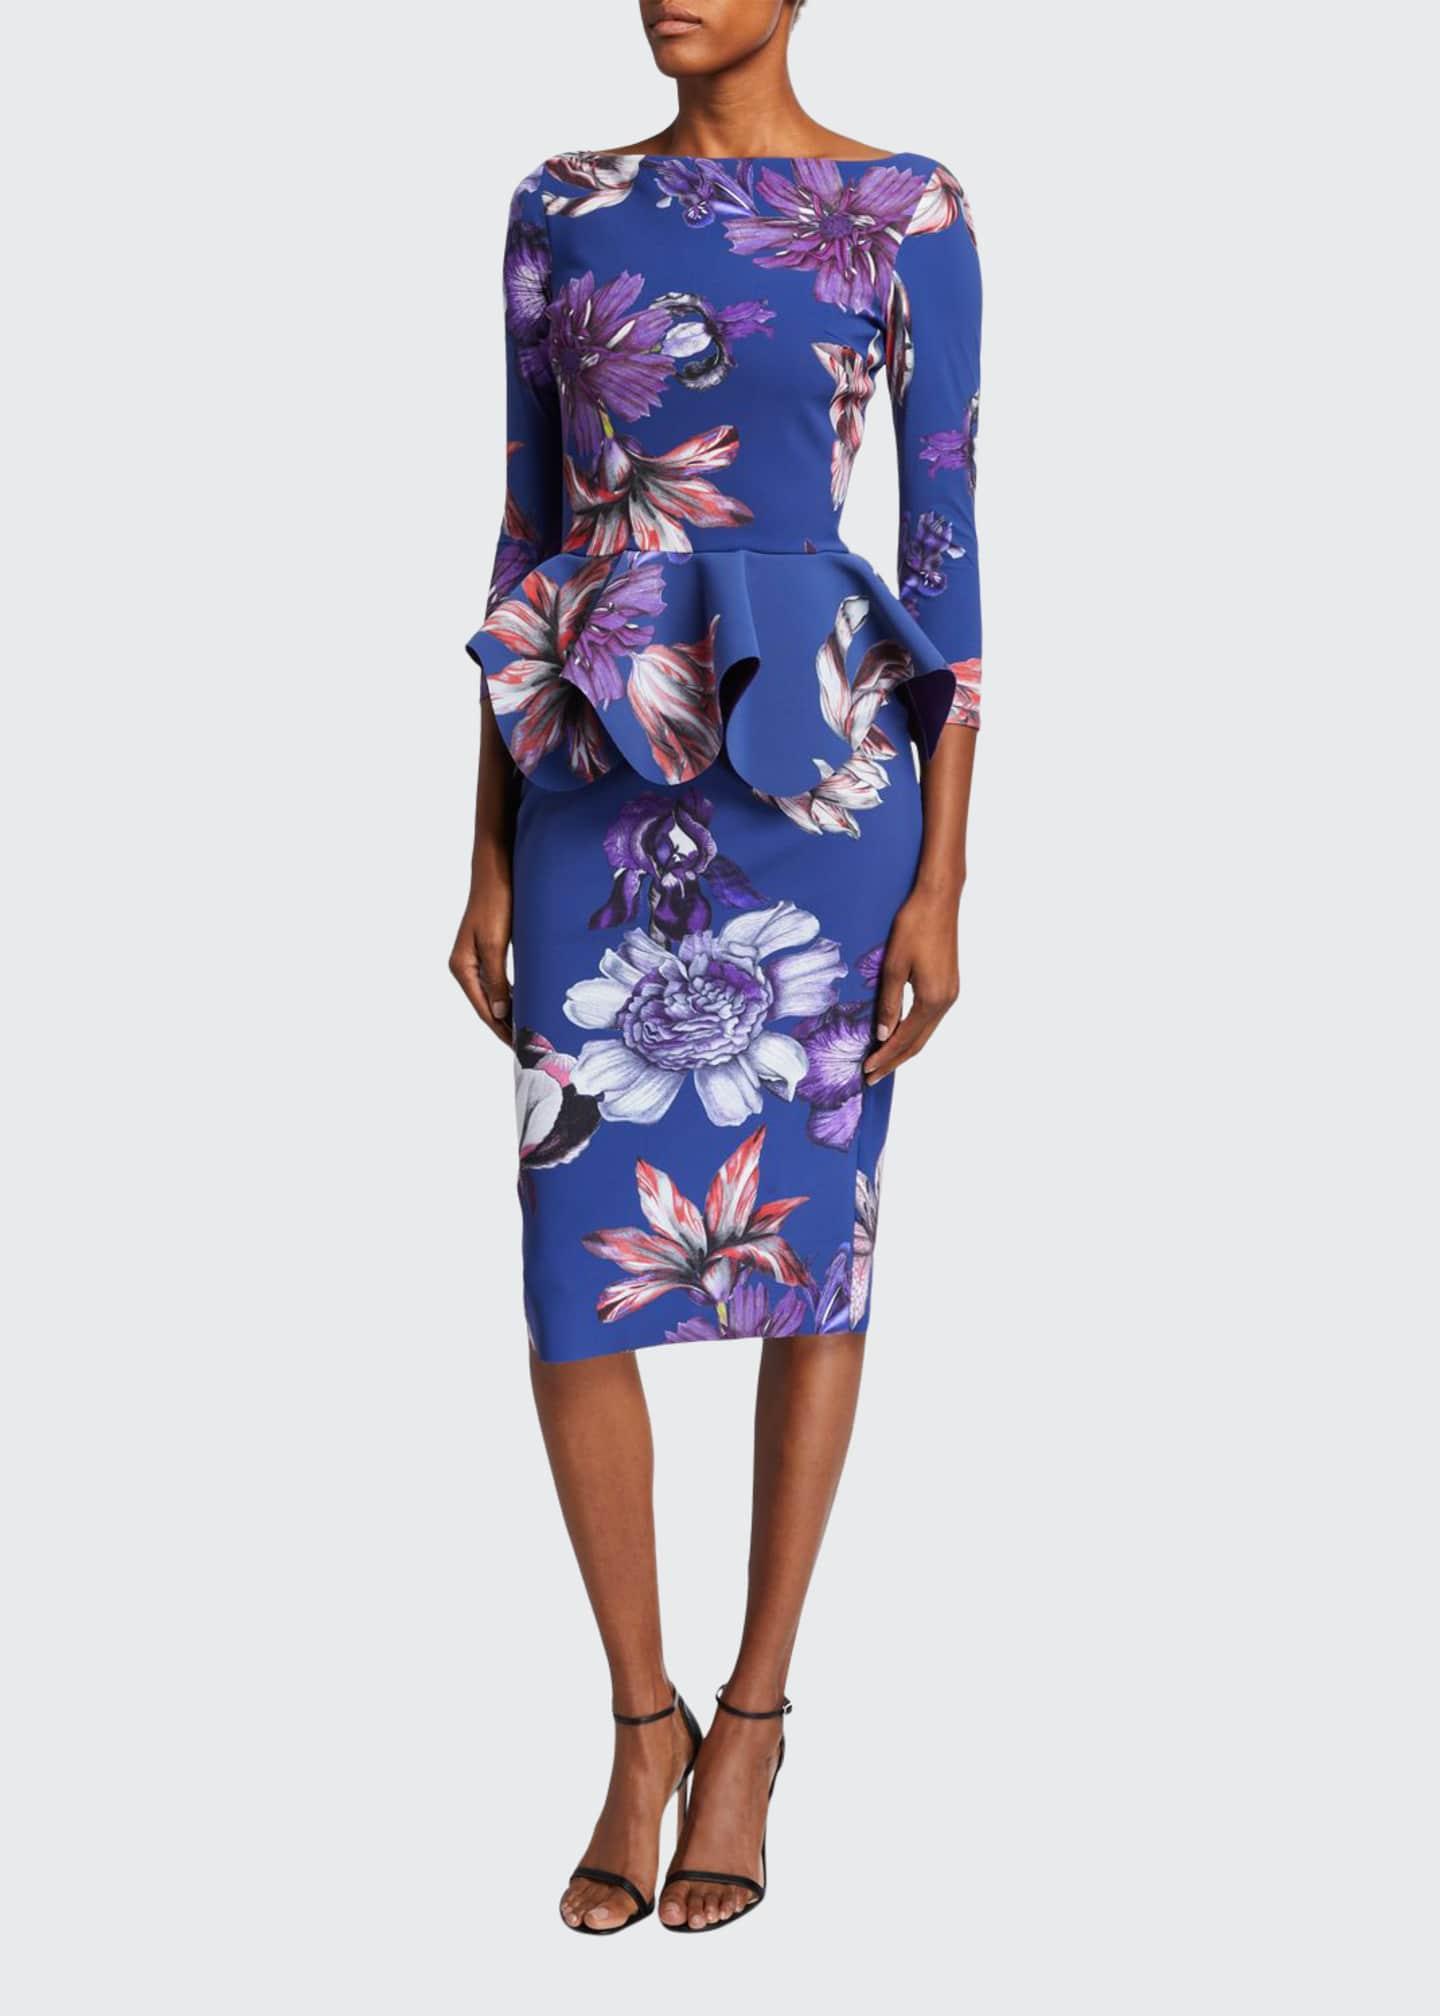 Chiara Boni La Petite Robe Floral High-Neck Long-Sleeve